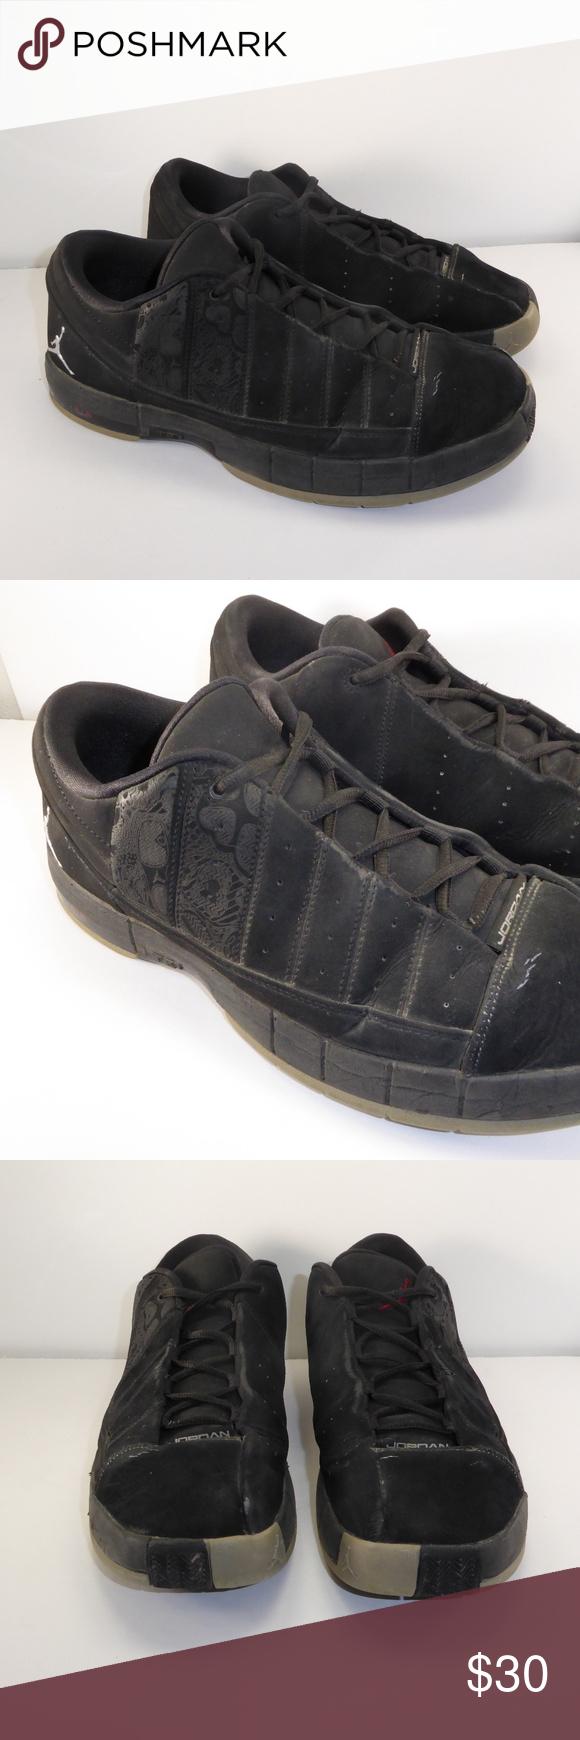 new concept acb39 01d4e ... Air Jordan TE 2 Advance Mens Size 11 057 ...